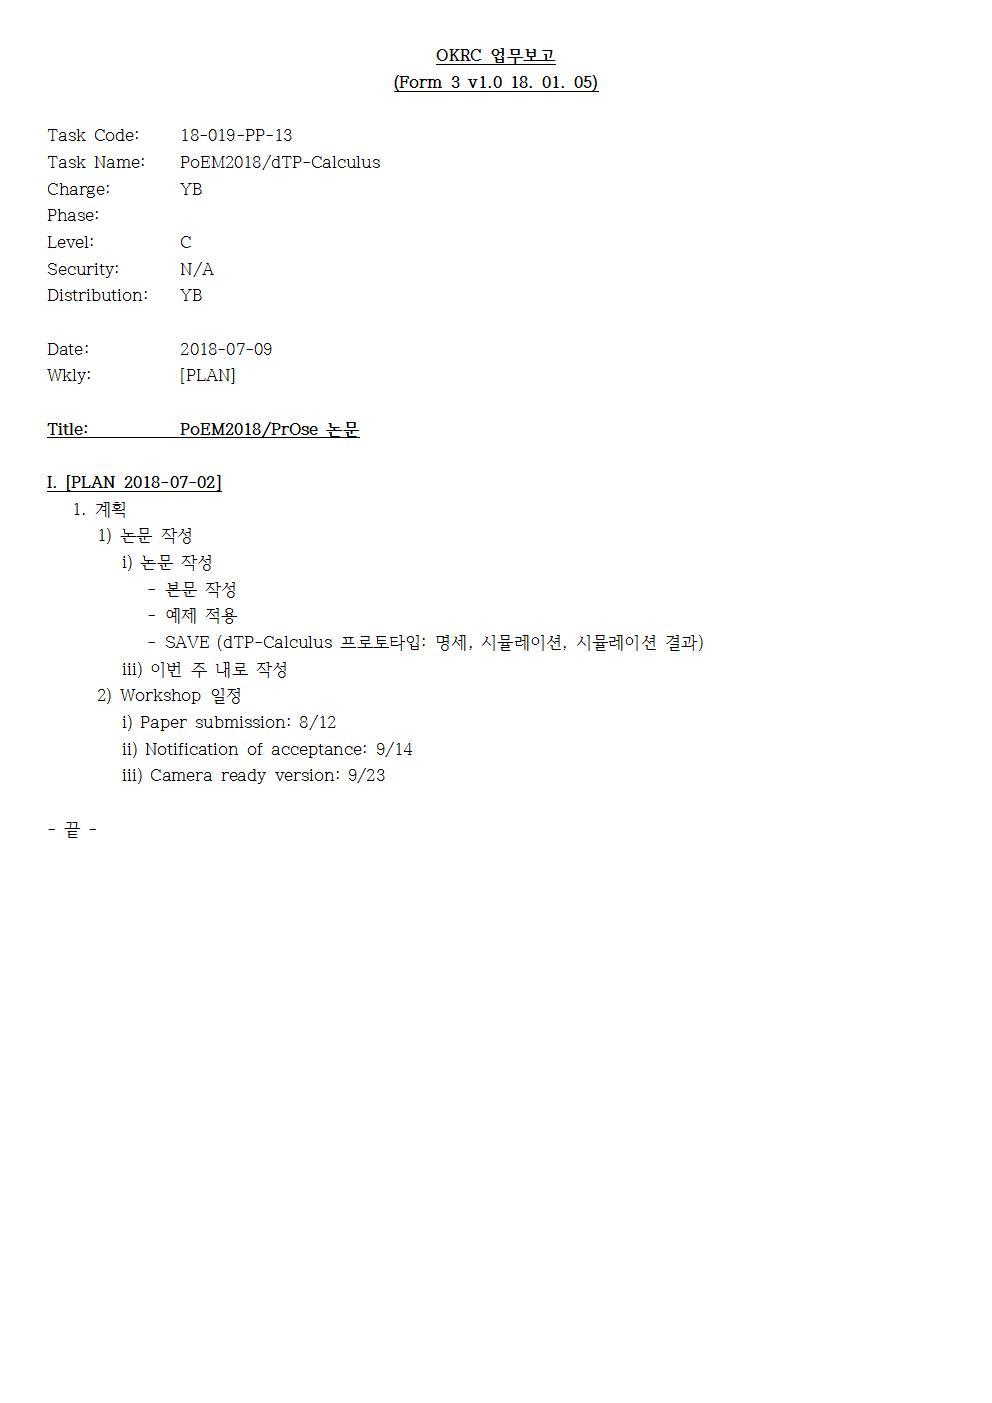 D-[18-019-PP-13]-[POEM]-[2018-07-09][YB]001.jpg